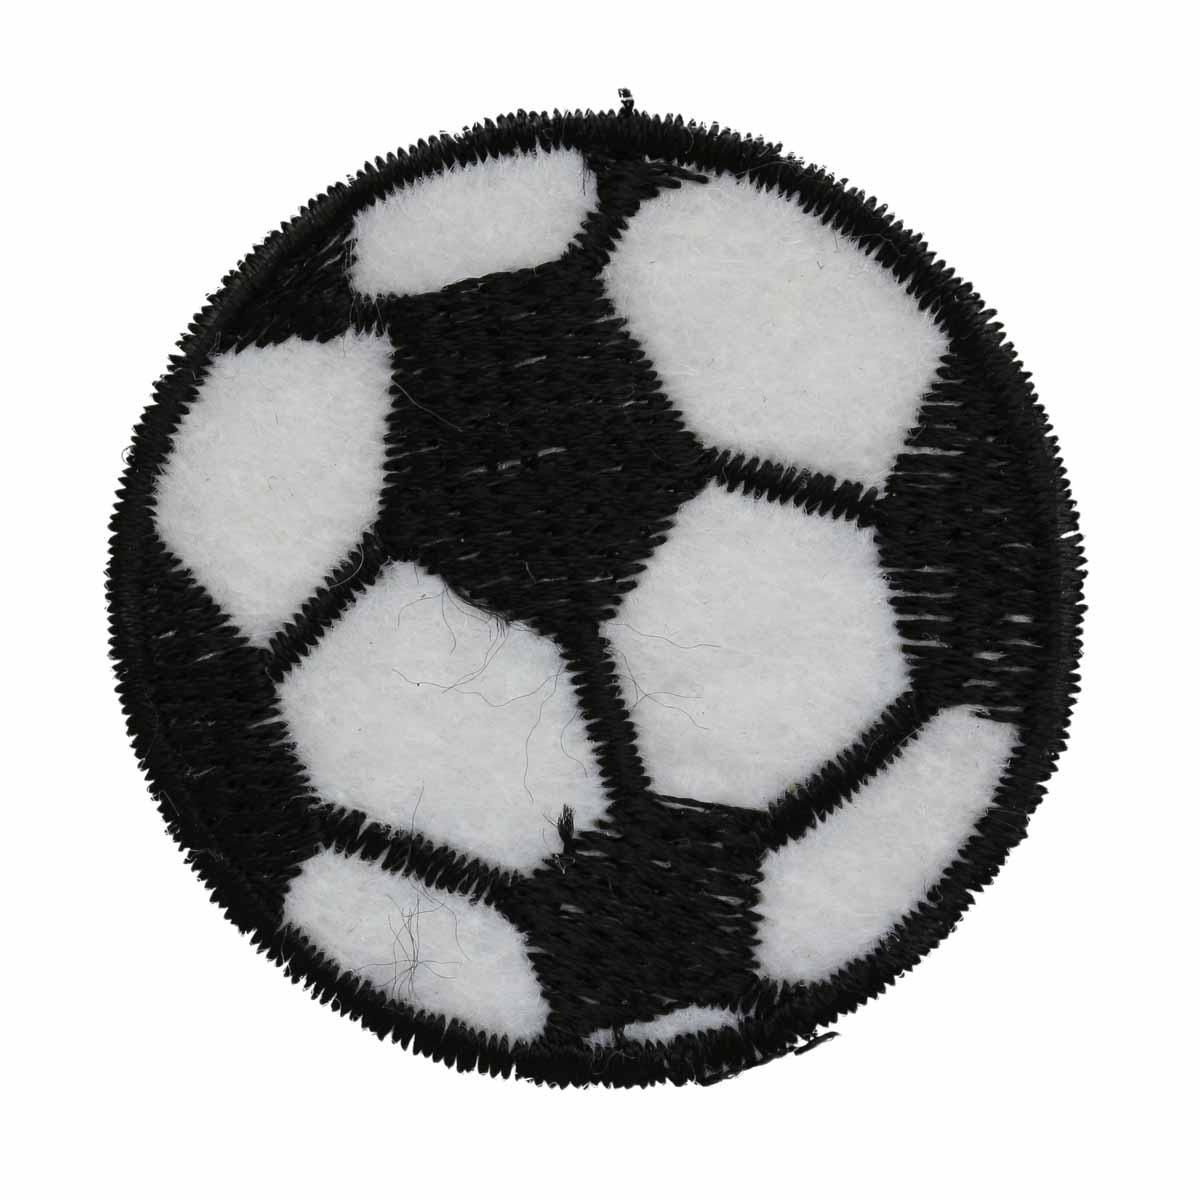 Термоаппликация LM-80383 'Мячик' 1шт Hobby&Pro basic